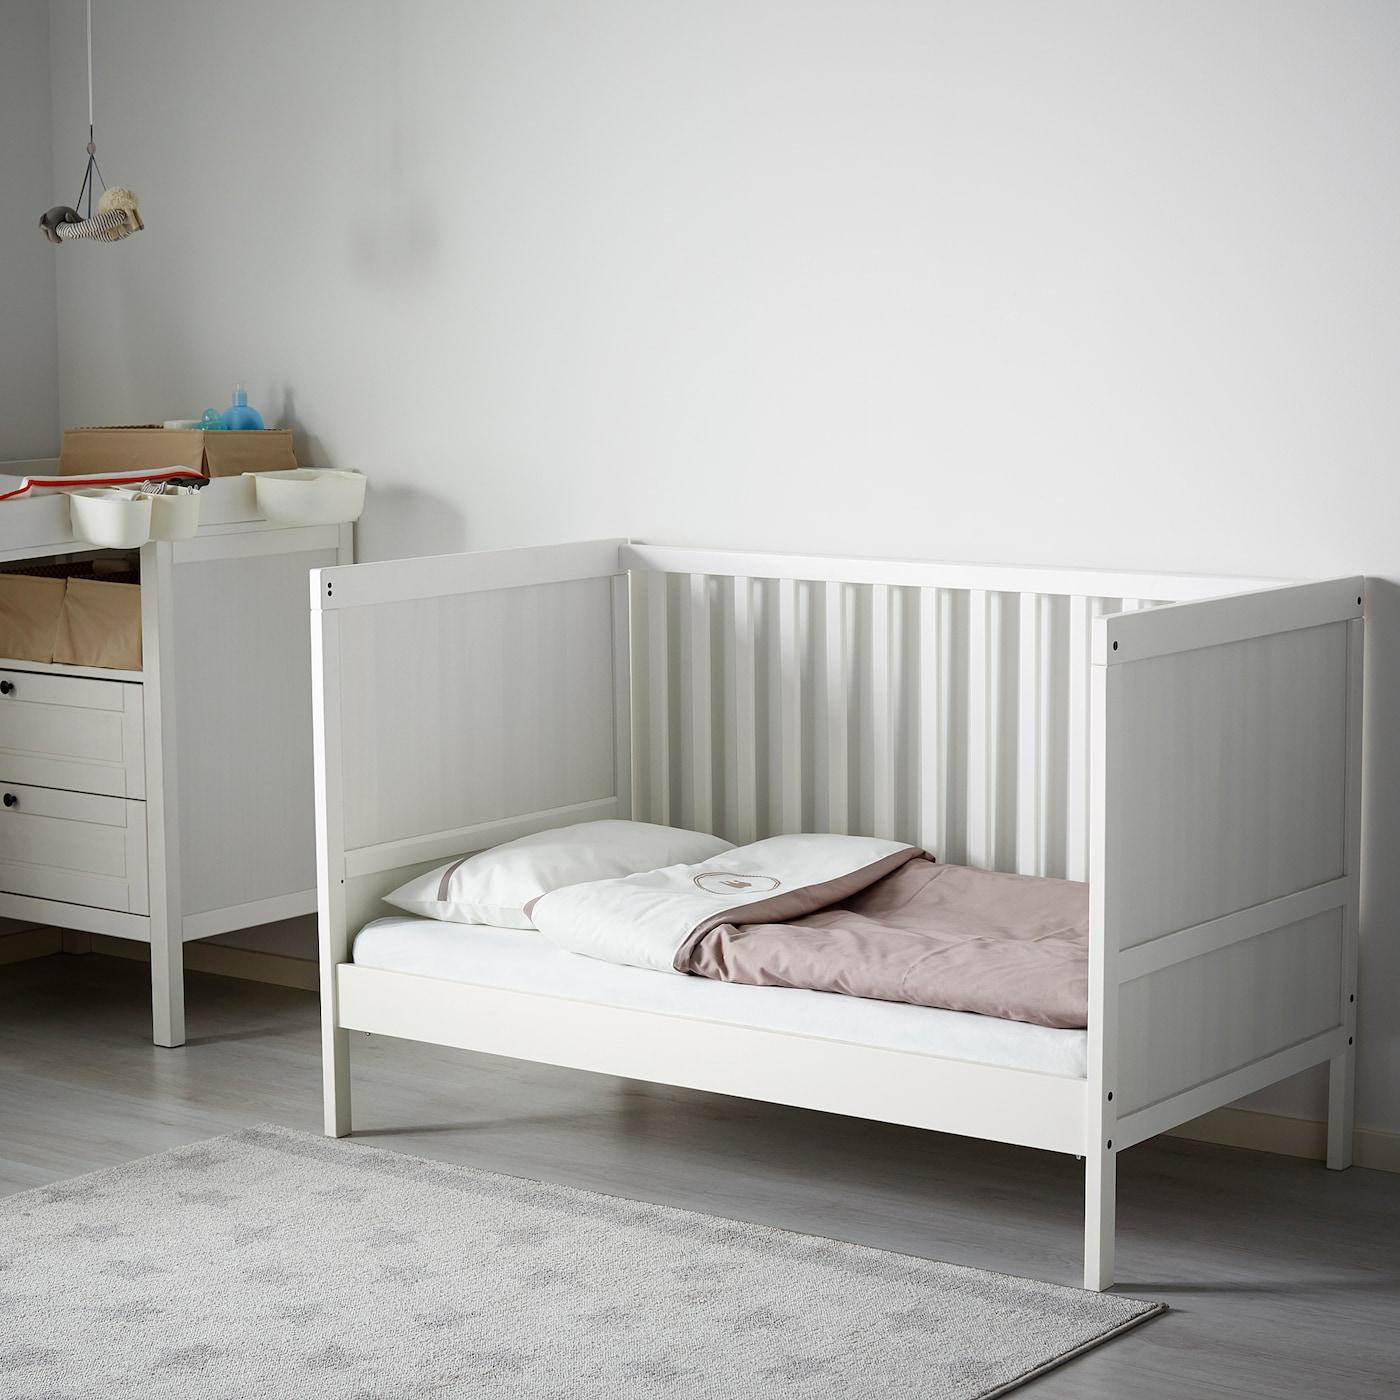 Sundvik Crib White 27 1 2x52 Ikea